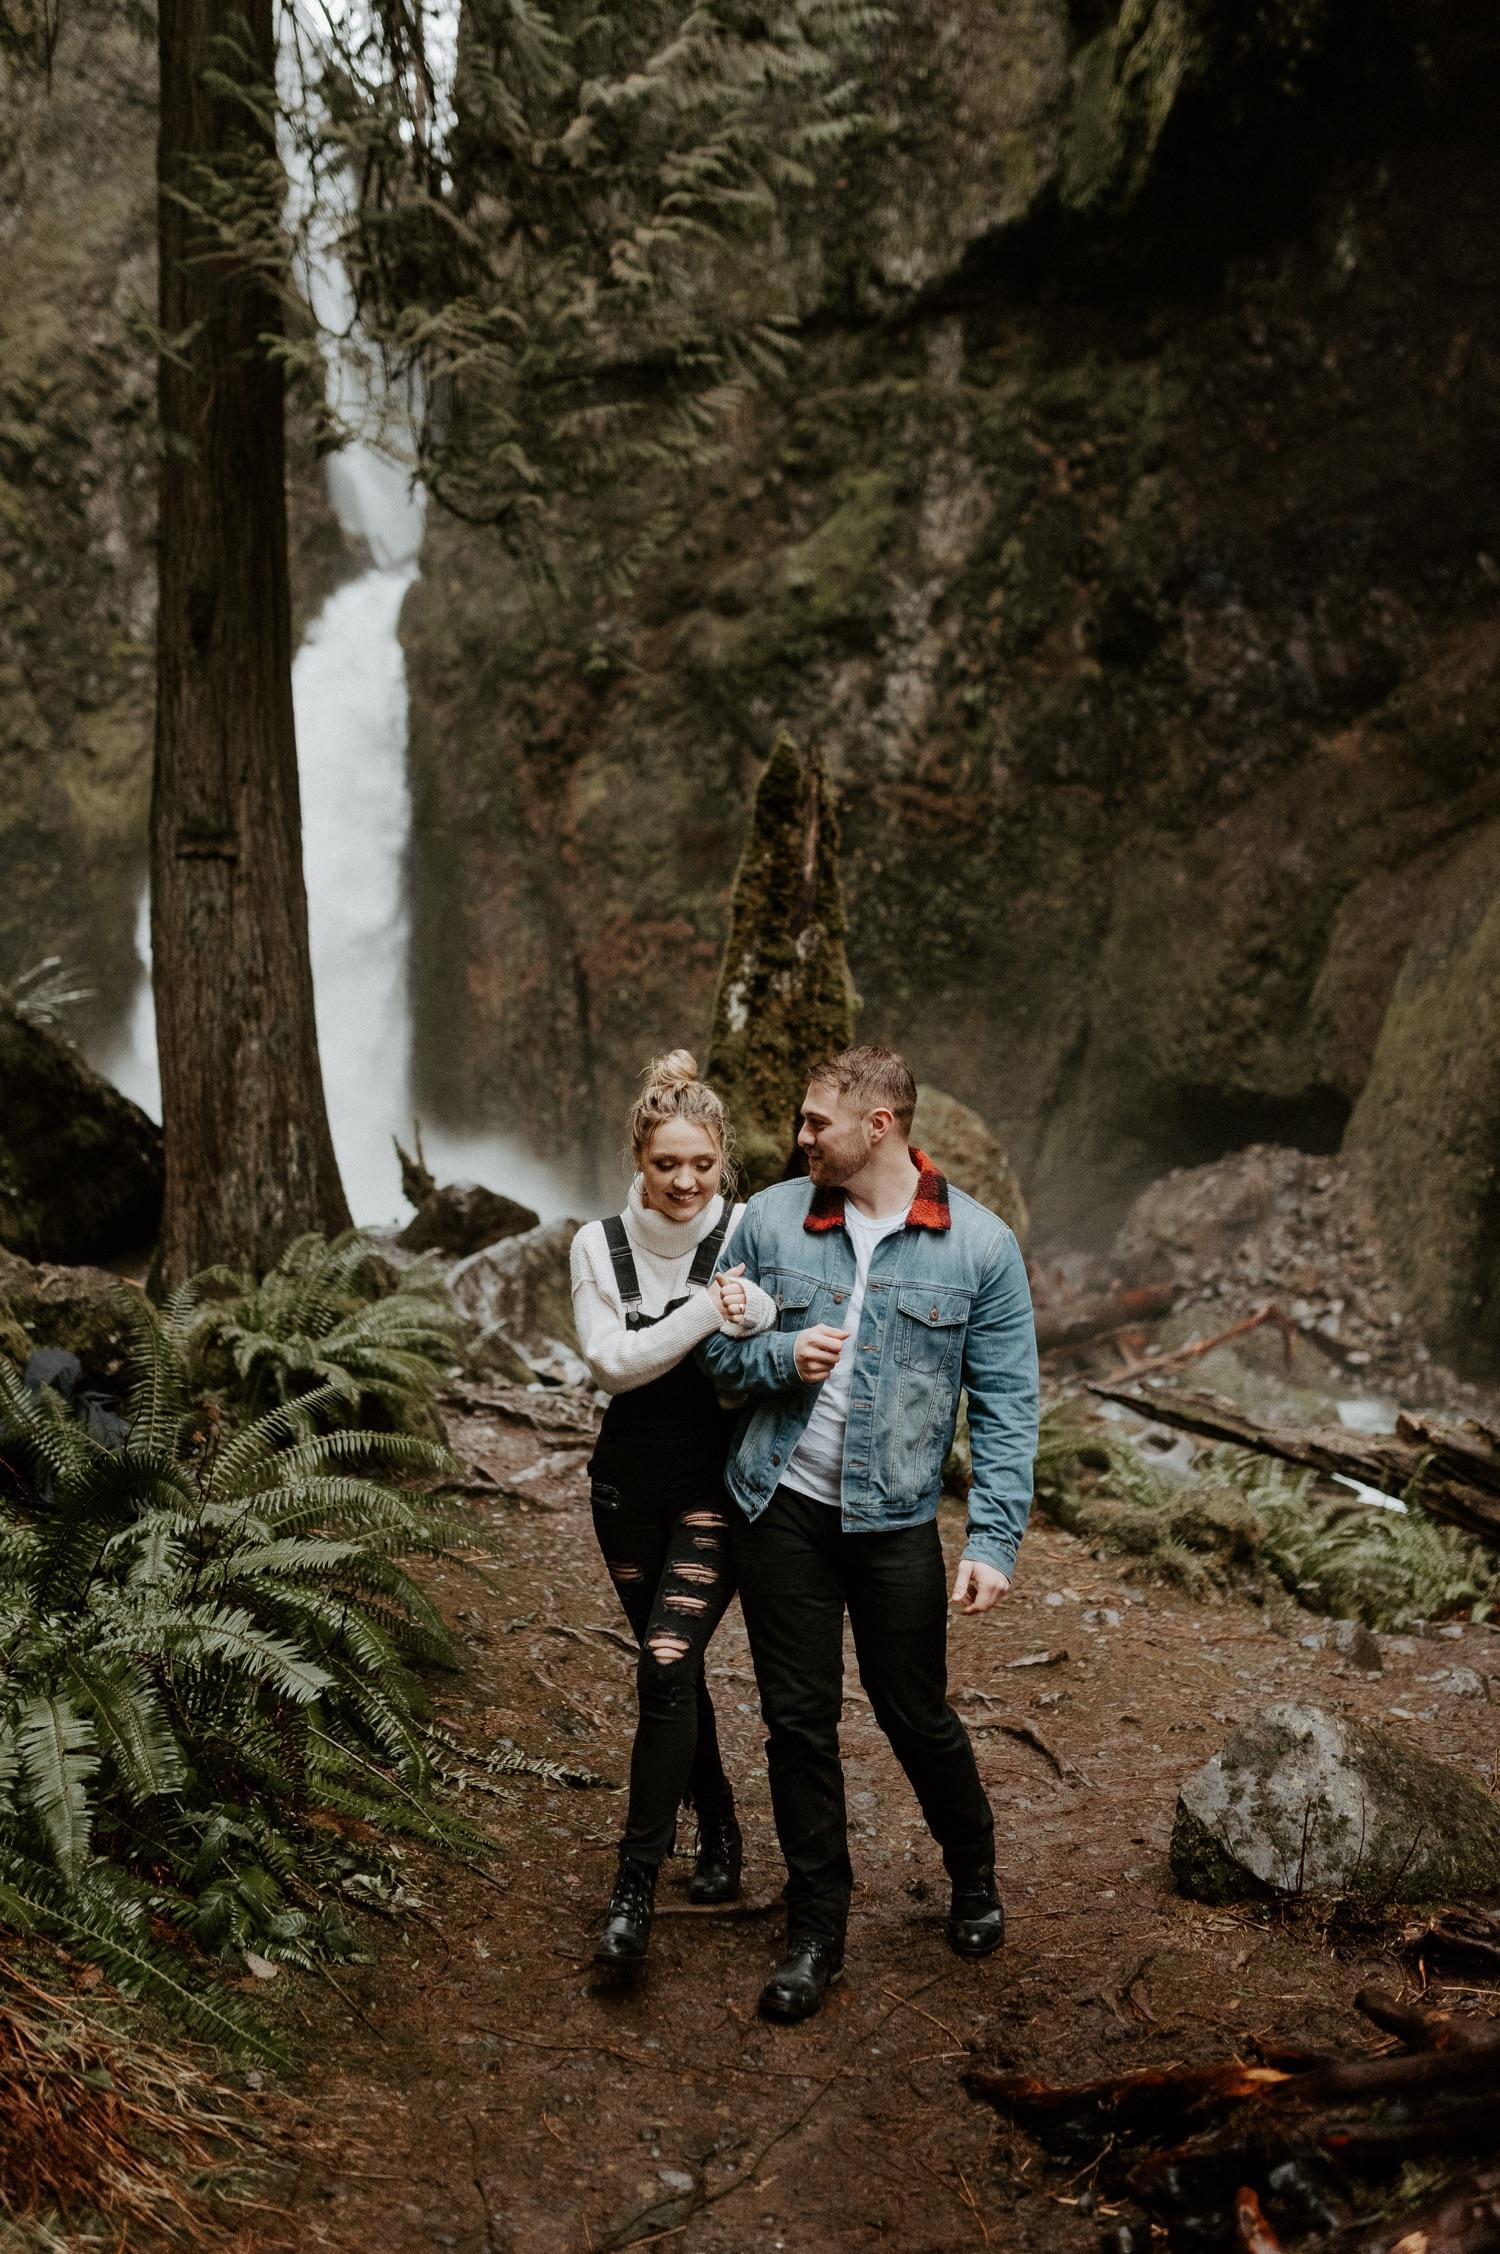 Wahclella Falls Engagement Session Columbia River Gorge Oregon Portland Wedding Photographer PNW Elopement Photographer Bend Wedding Photographer Anais Possamai Photography 047